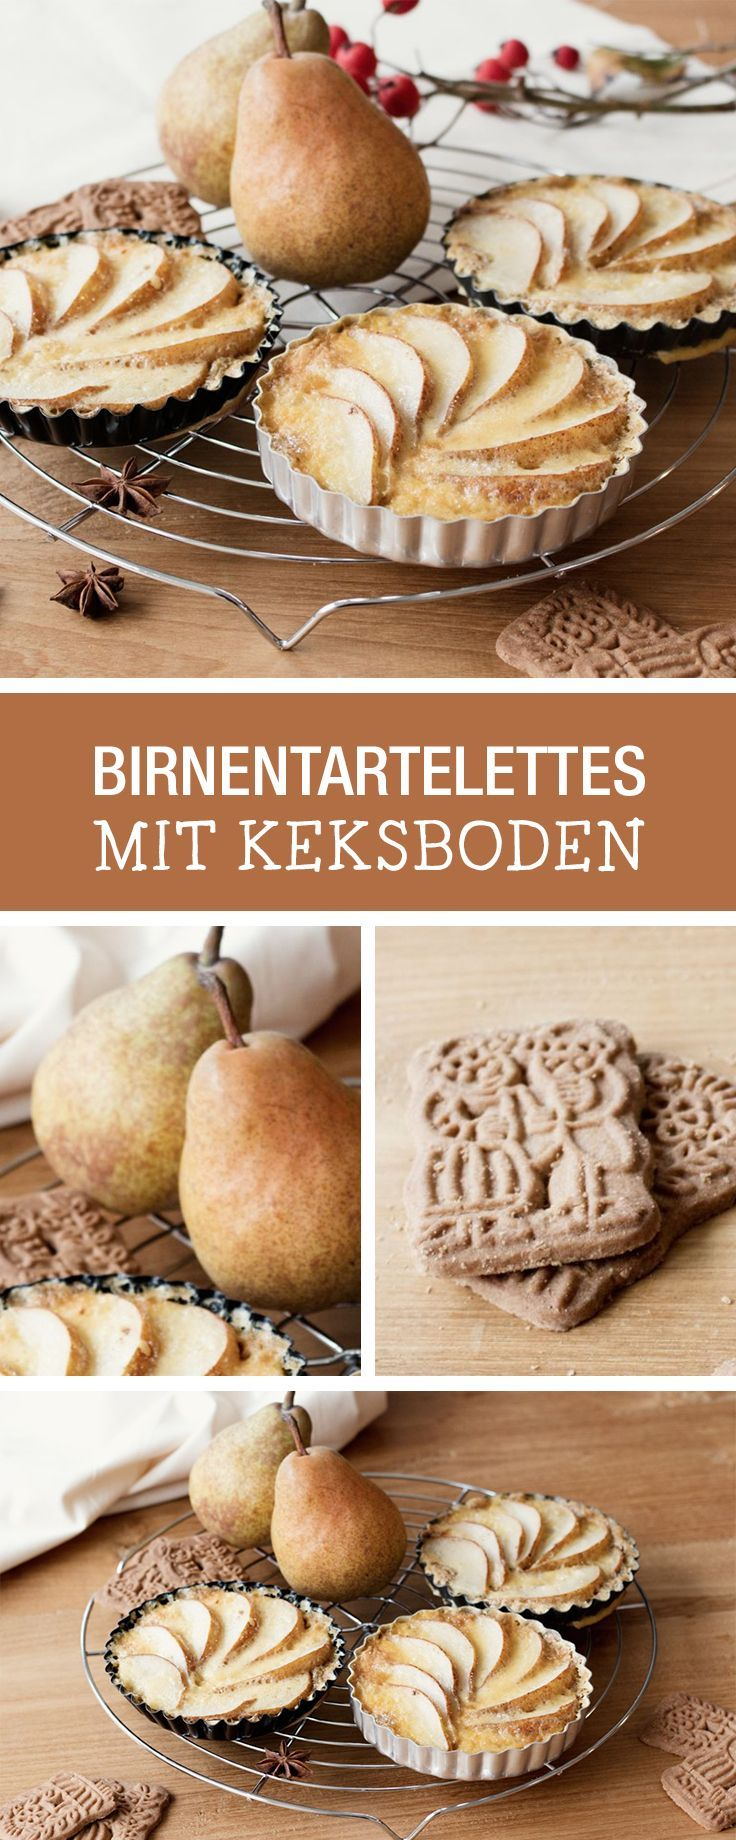 backen im herbst tartelettes mit birnen und keksboden recipes for fall tartelettes with. Black Bedroom Furniture Sets. Home Design Ideas